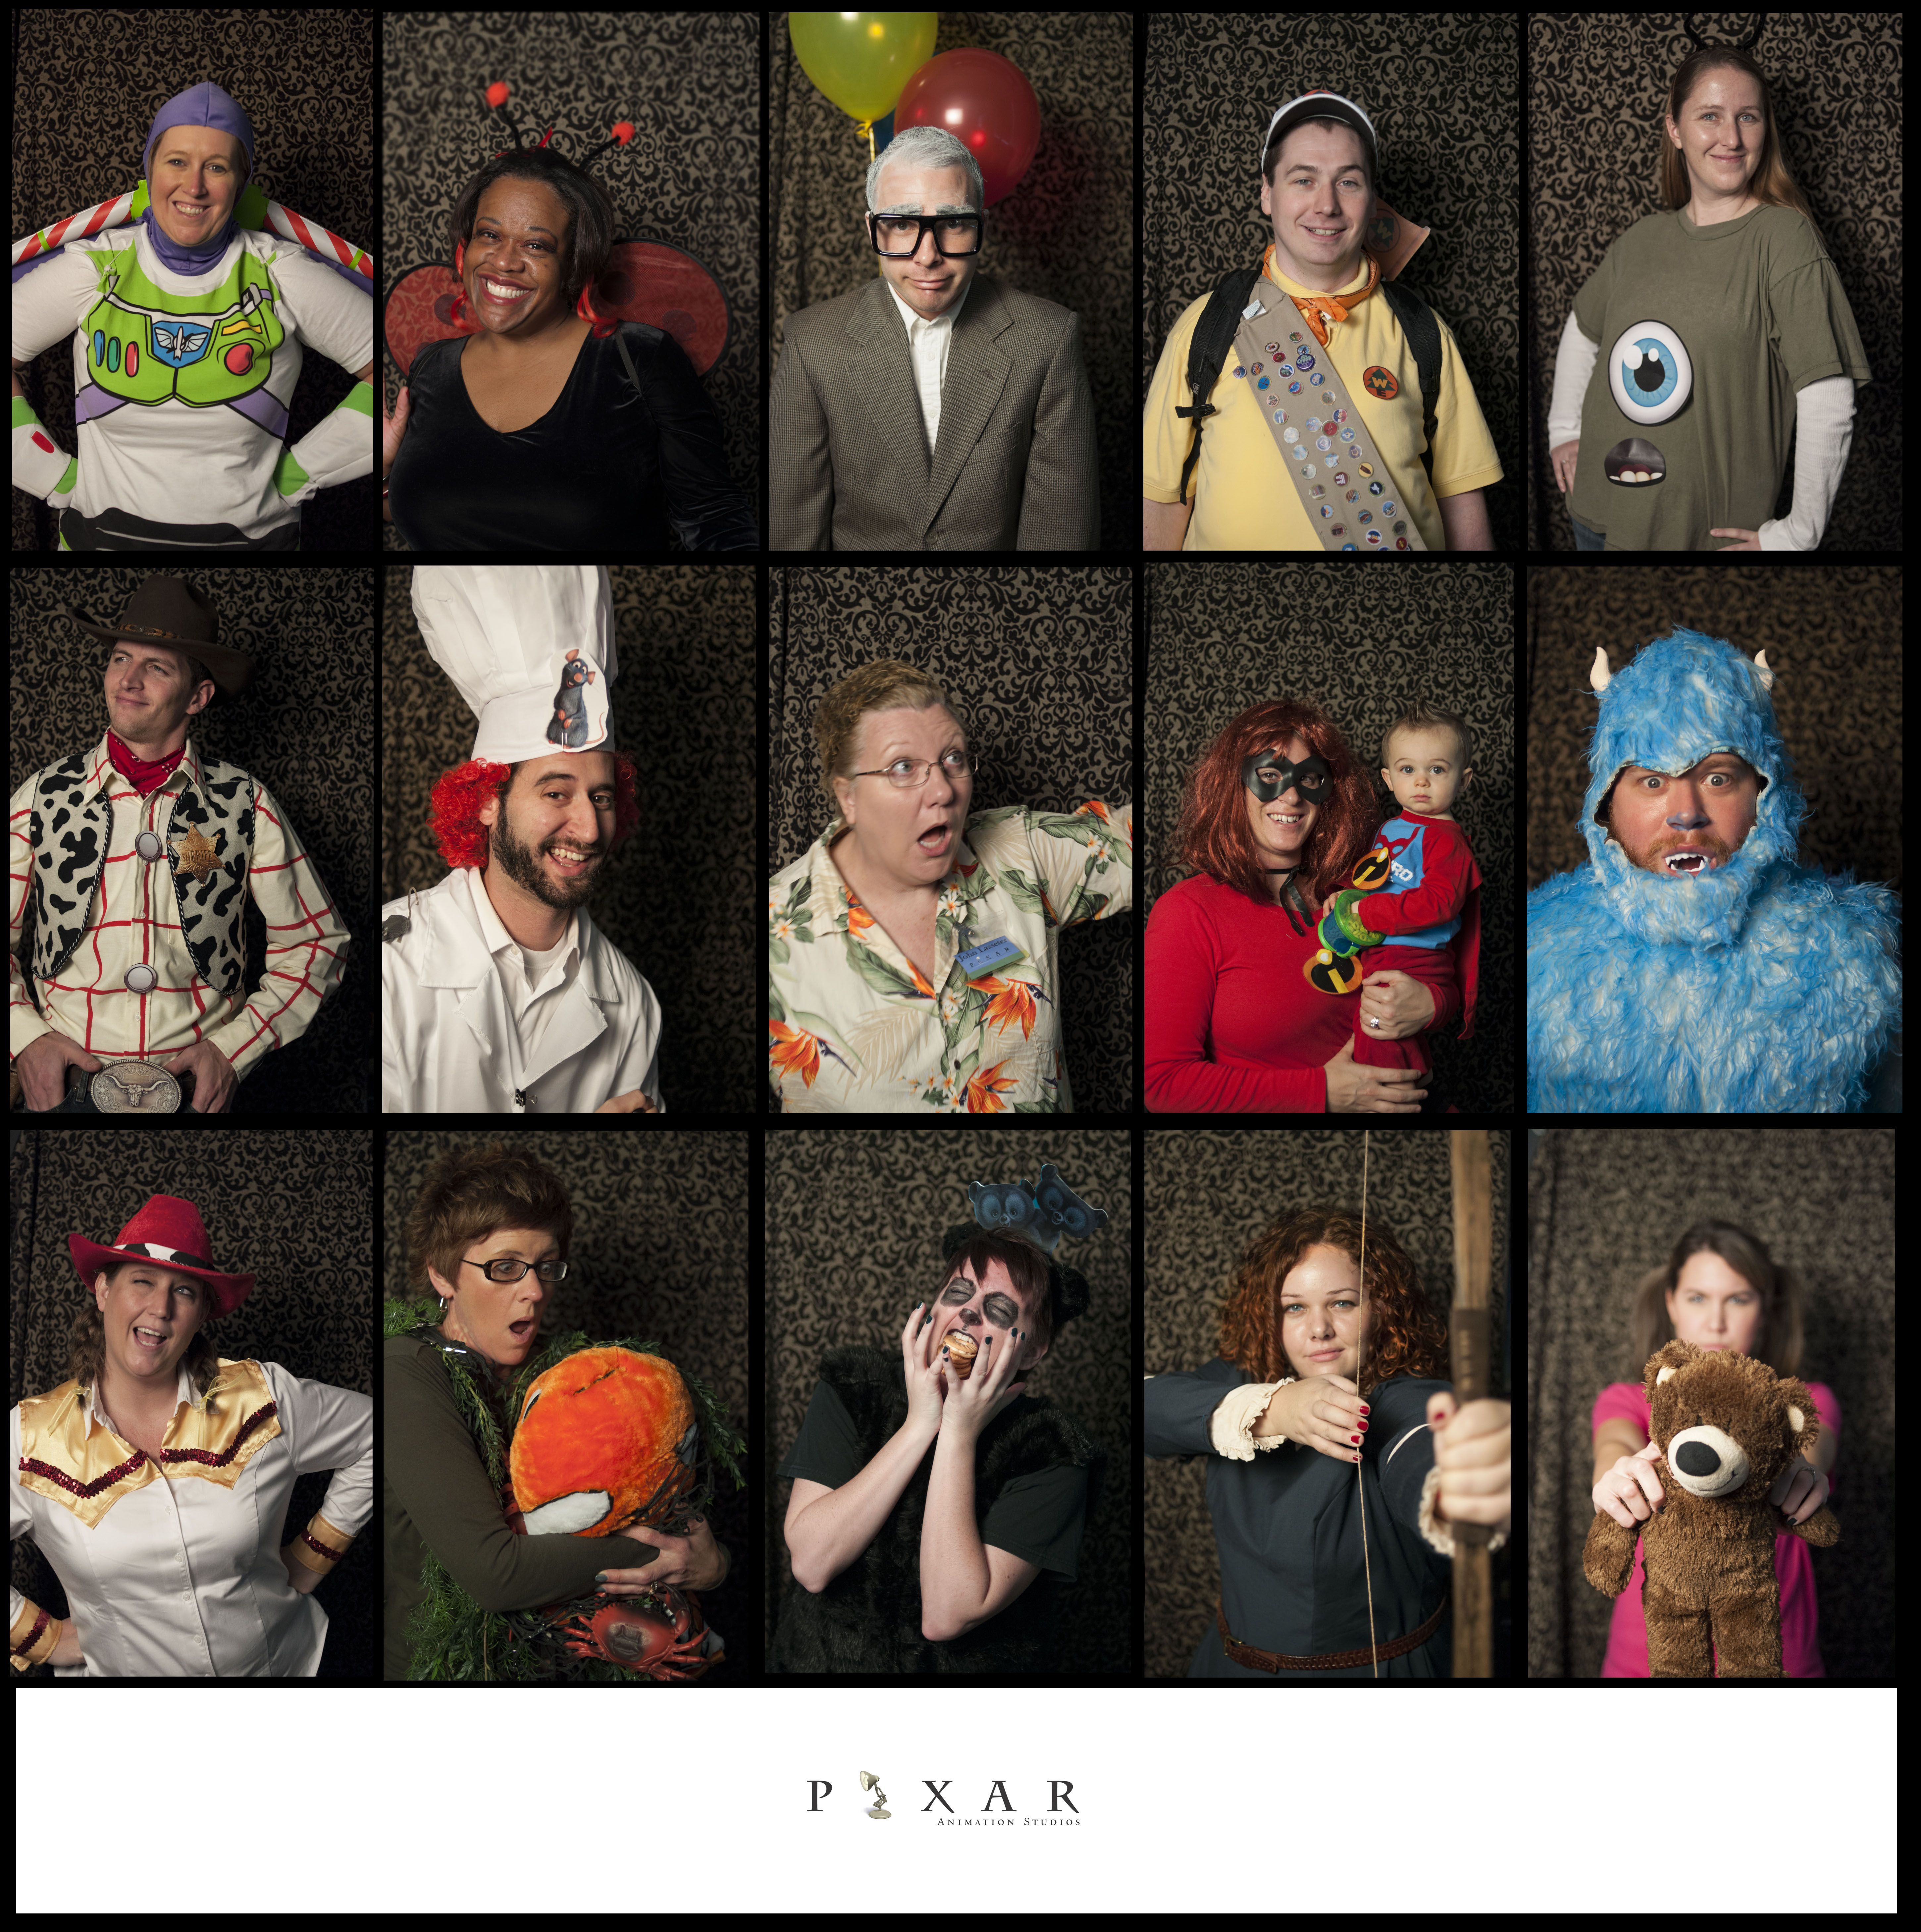 Office halloween costumes - Halloween At My Office Pixar Costumes Pixar Characters